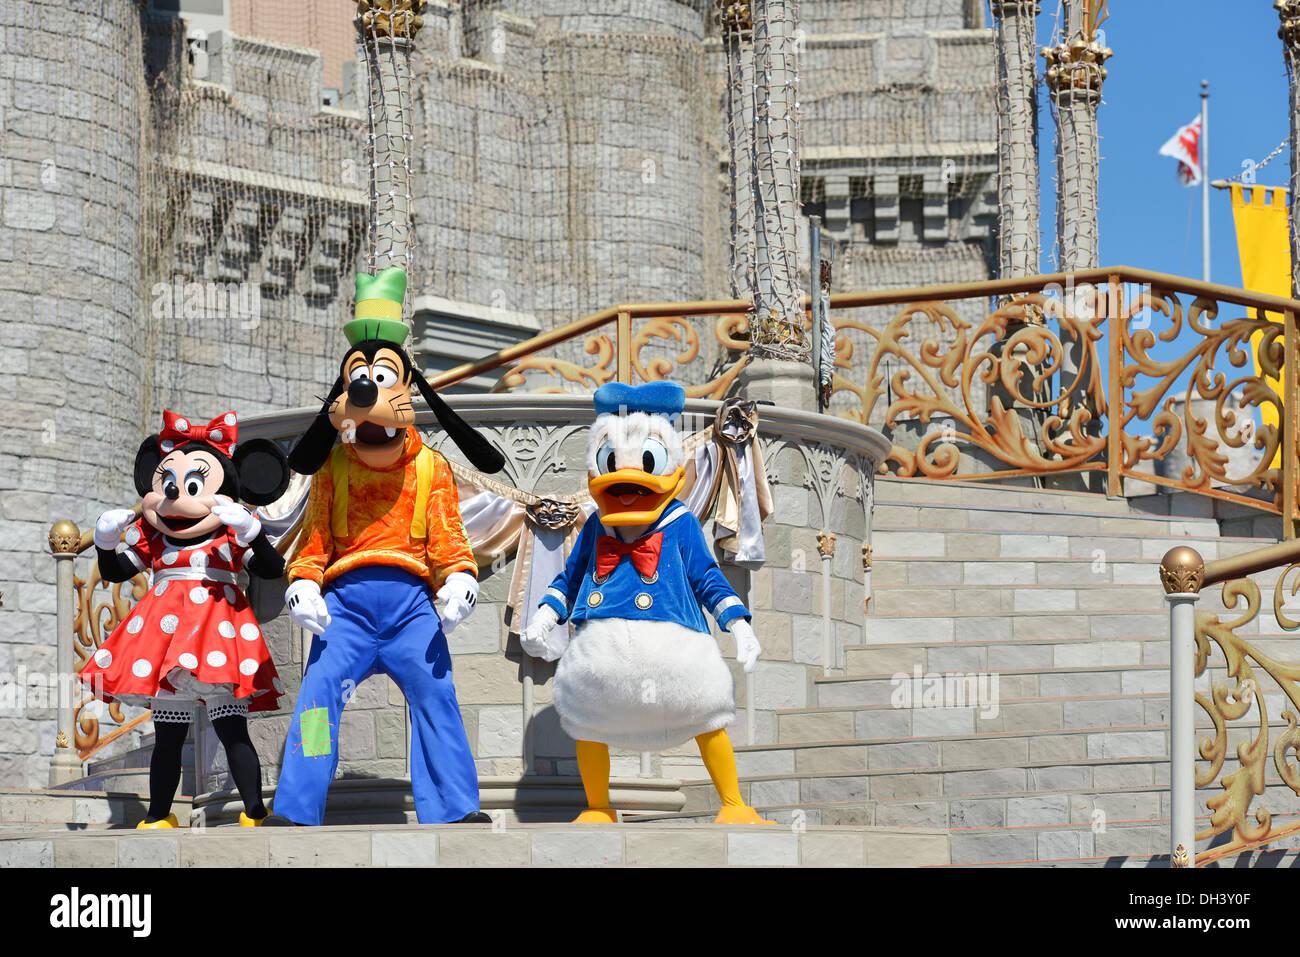 Minnie Mouse Goofy Donald Duck auf der Bühne, Traum entlang Show, Cinderella Castle, Magic Kingdom, Disneyworld, Stockbild